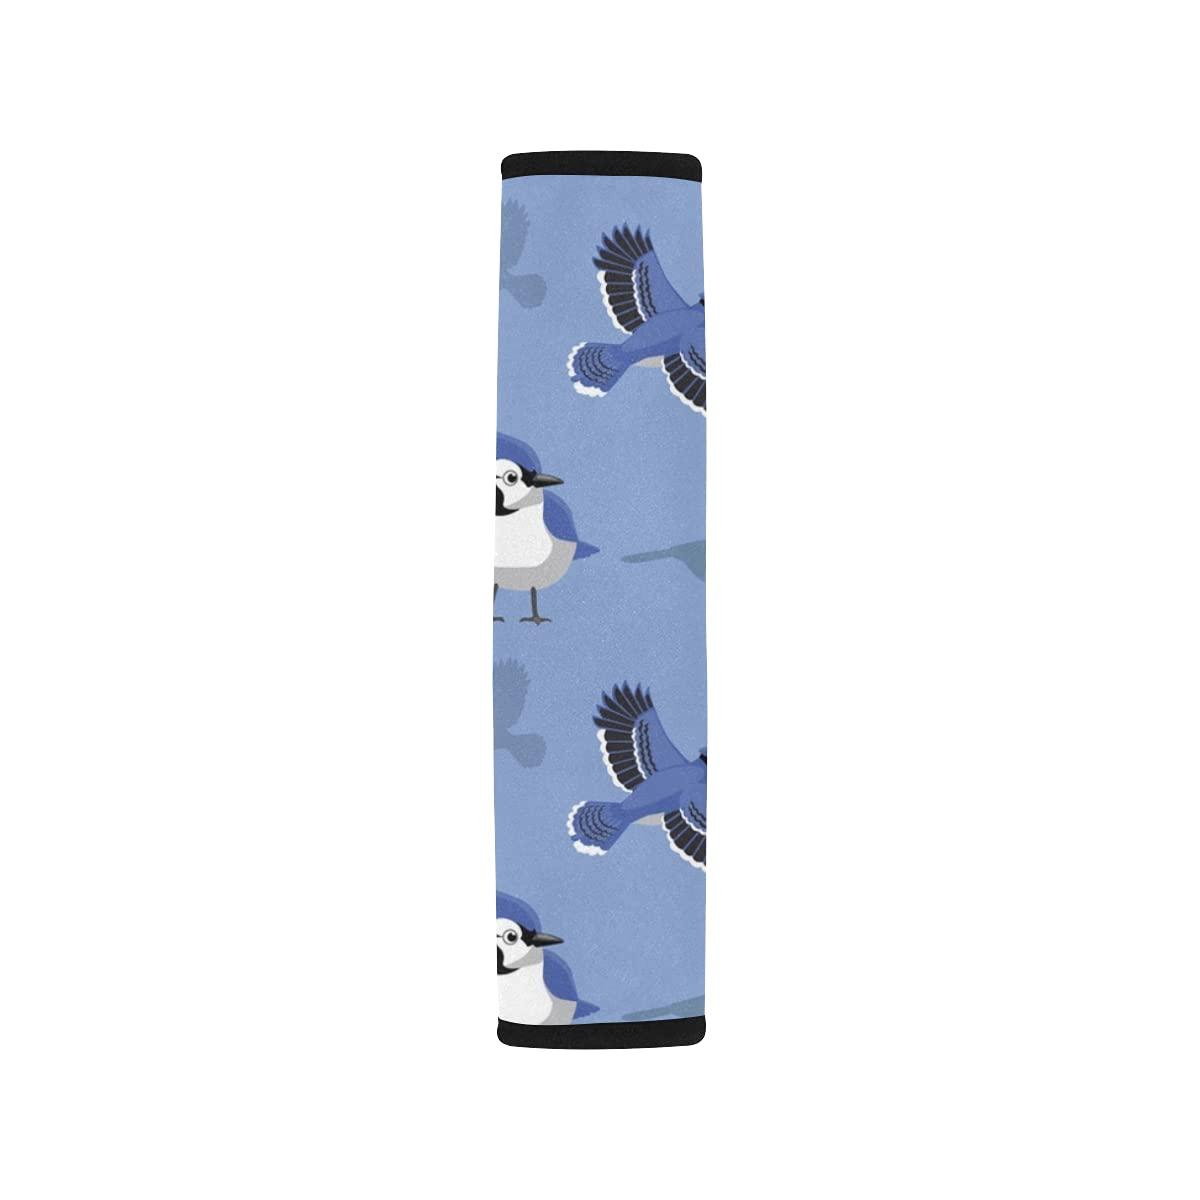 2pcs Car Seat Belt Cover 1 mart year warranty Blue Cartoon Jay Sea Wallpaper Shoulder